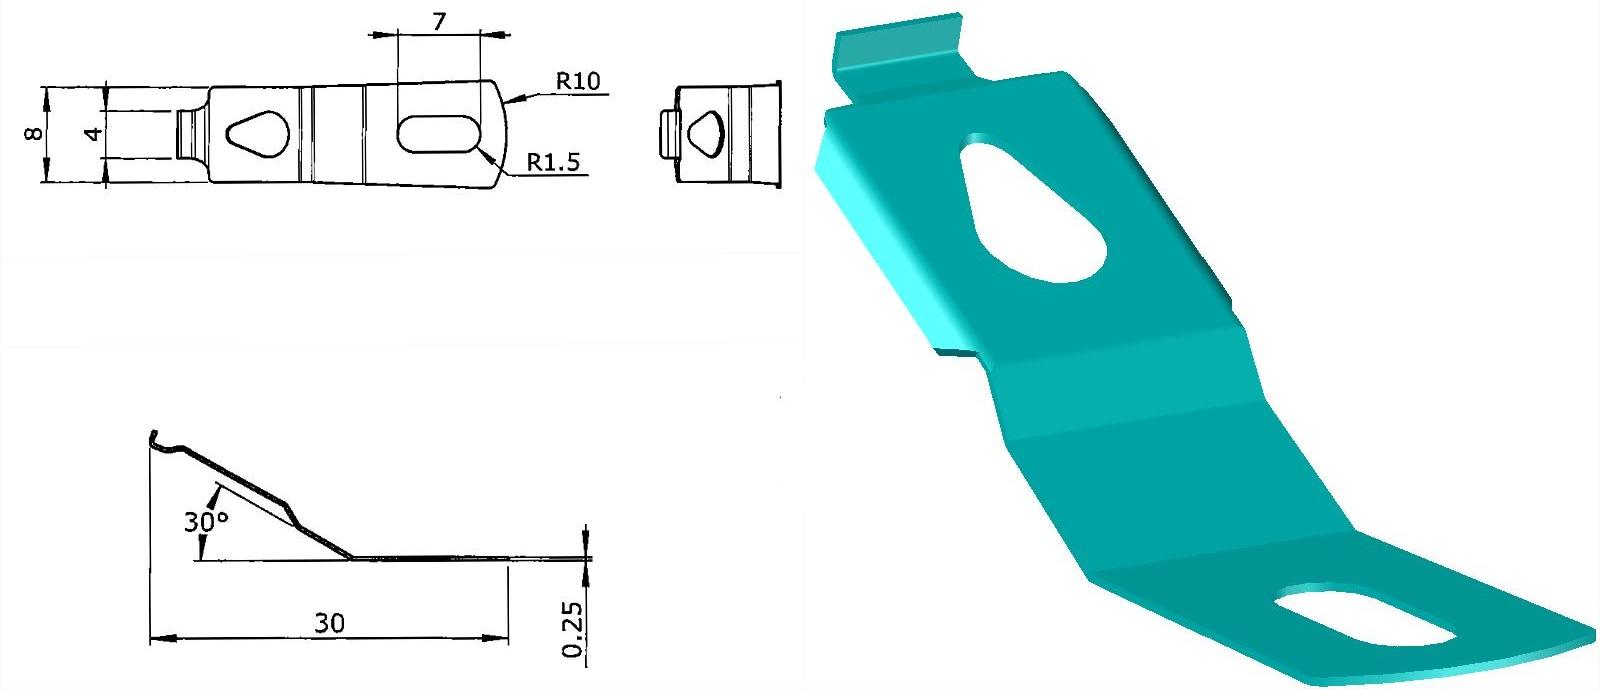 Mecanism de blocare, modelare 3D